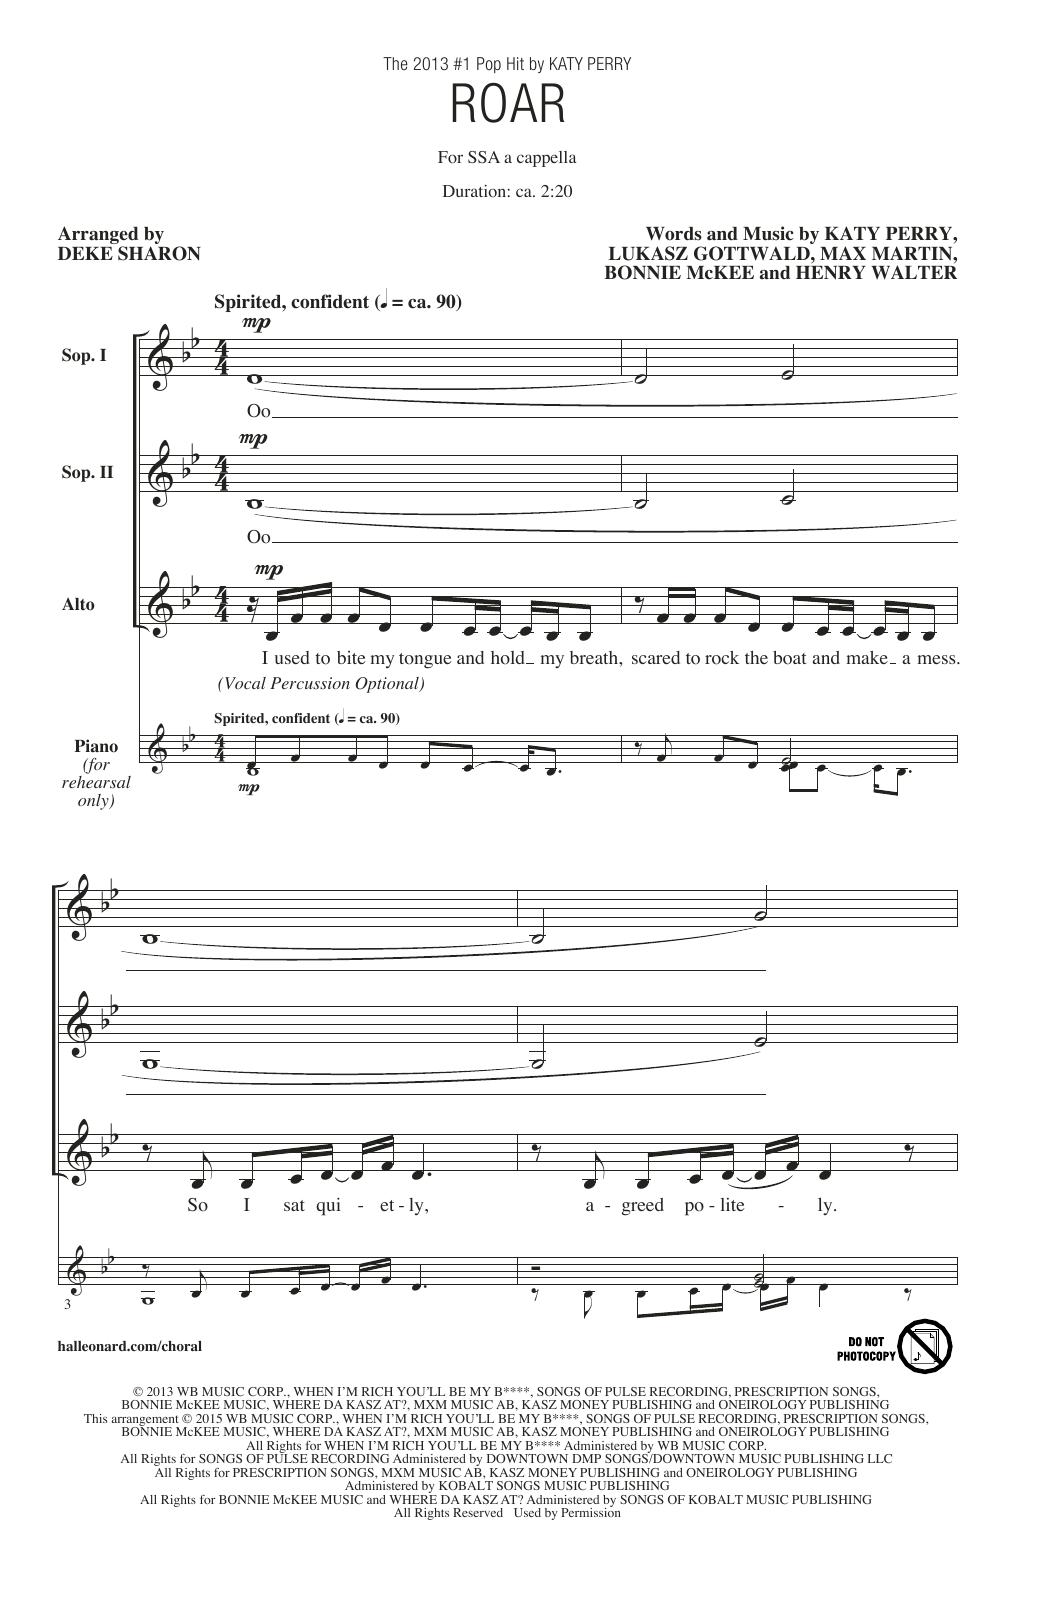 Deke Sharon Roar sheet music notes and chords. Download Printable PDF.